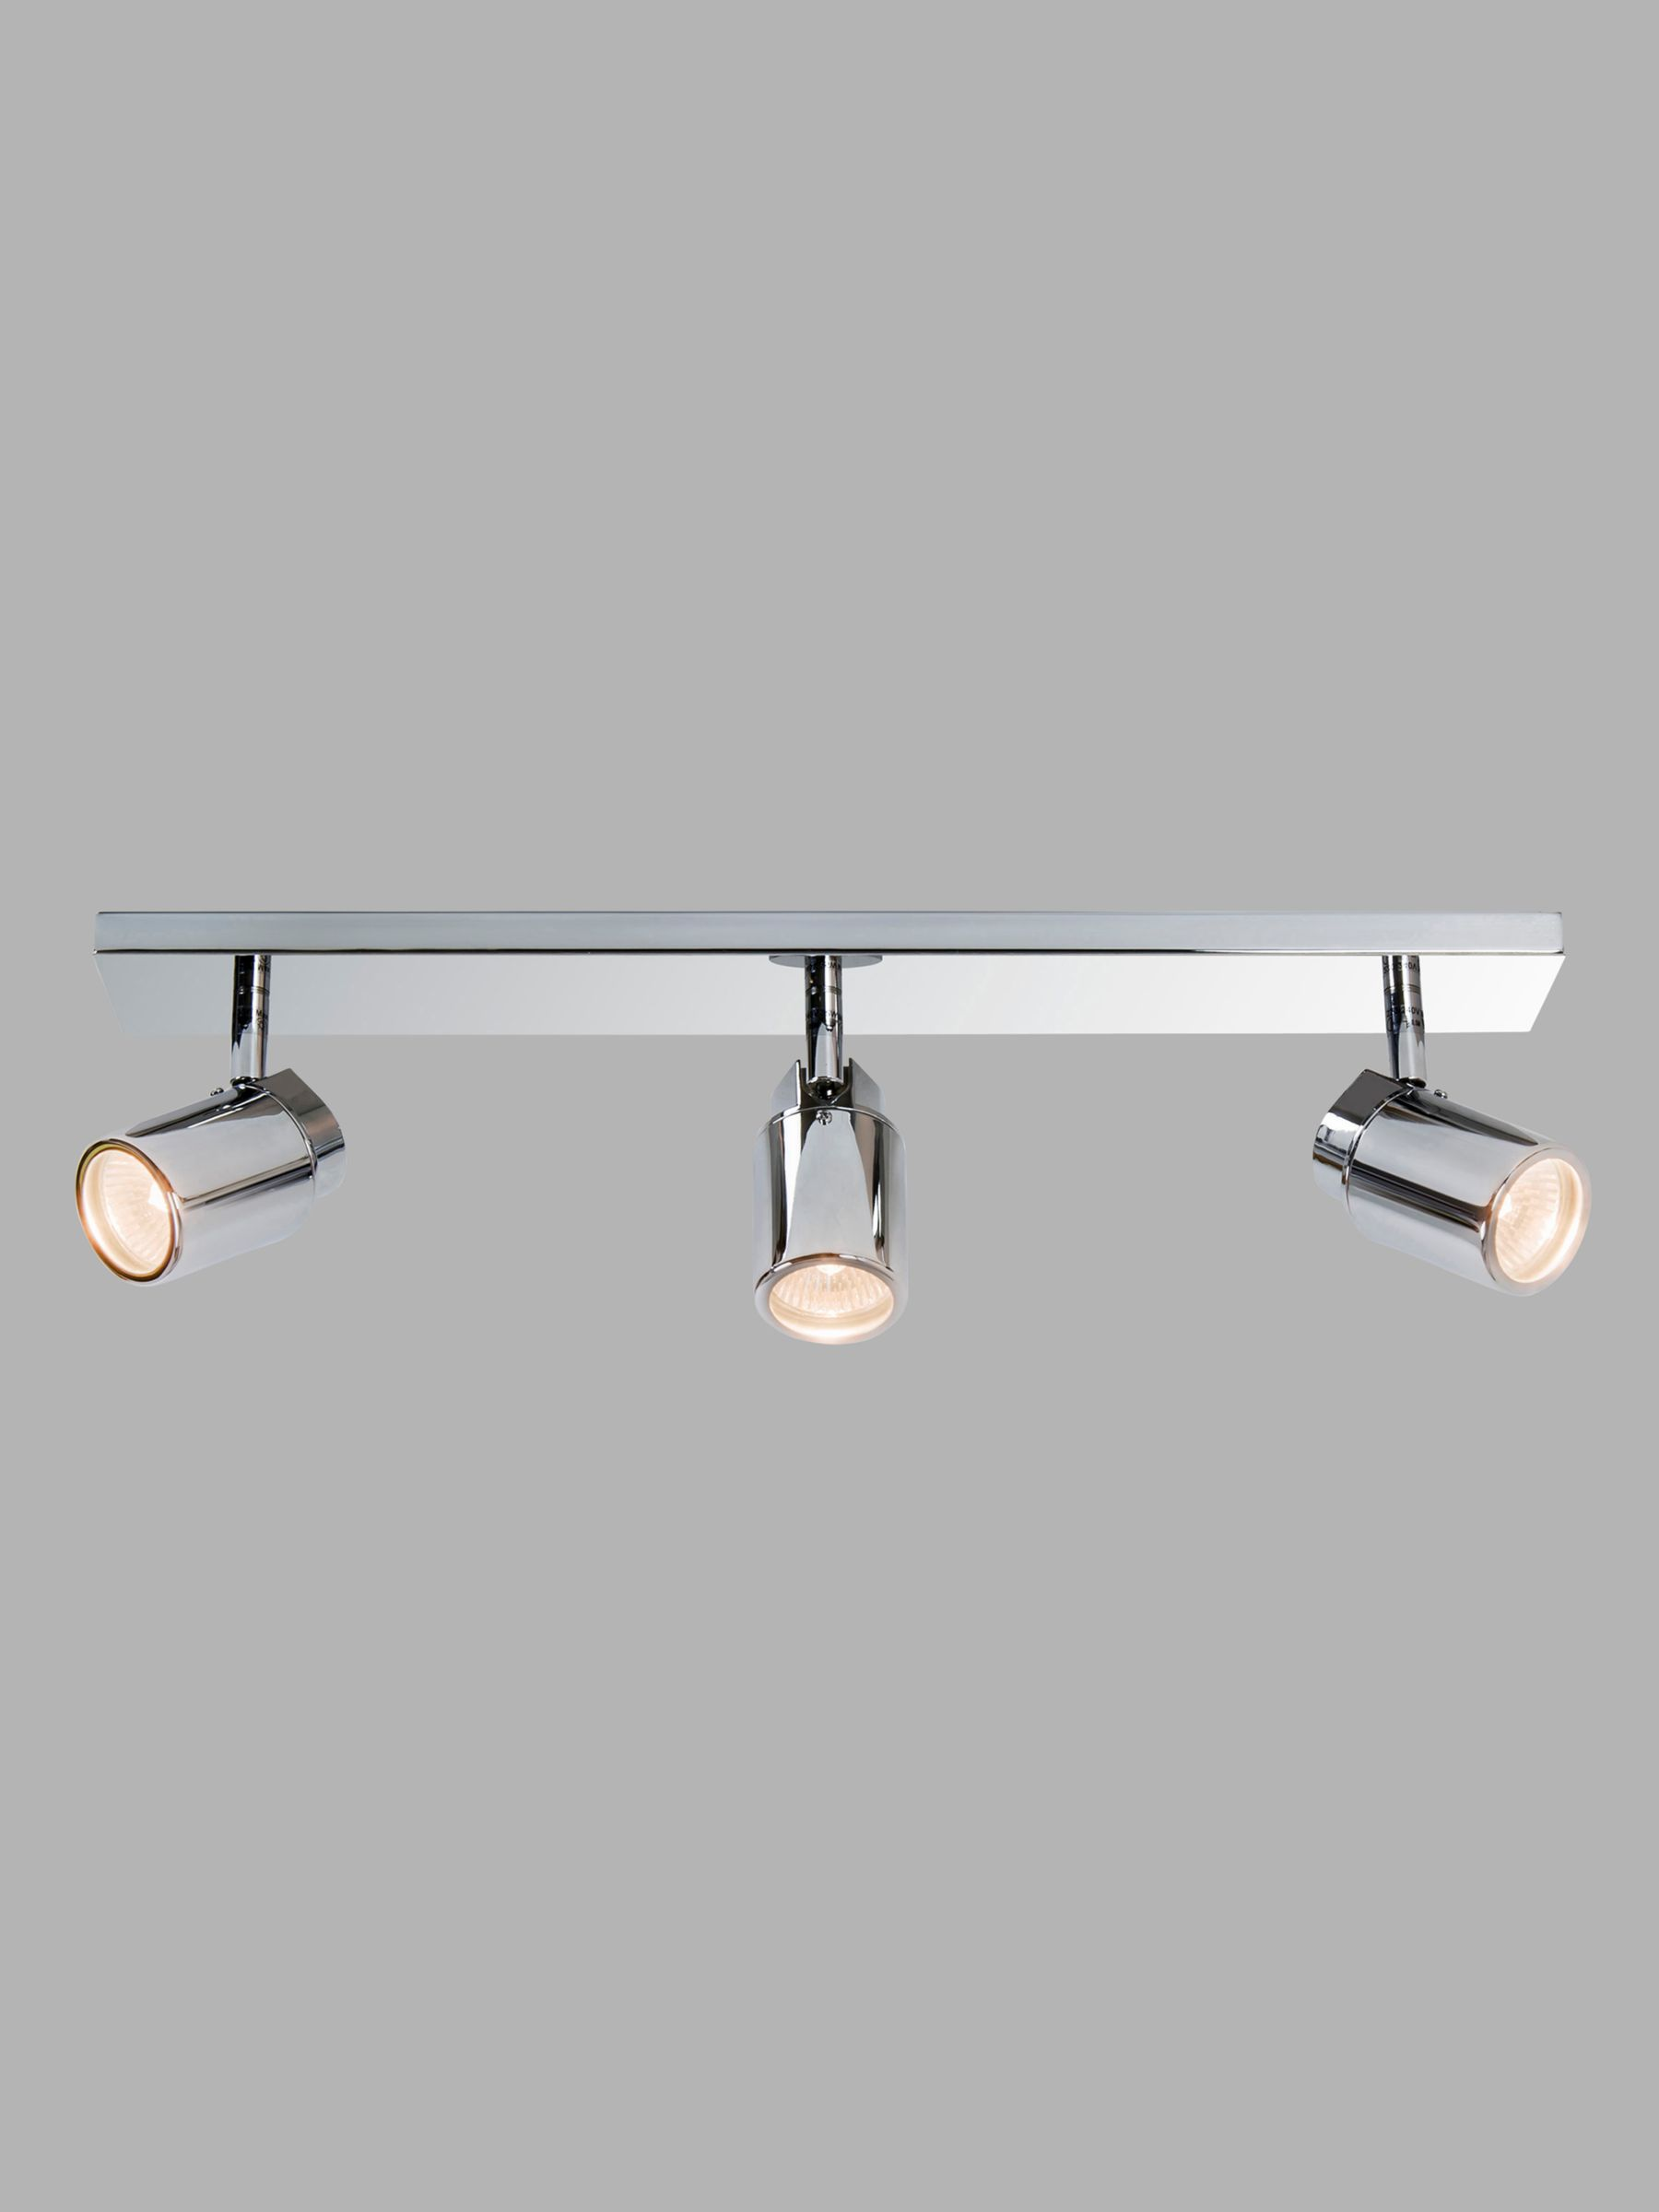 ASTRO Astro Como 3 Bathroom Spotlight Ceiling Bar